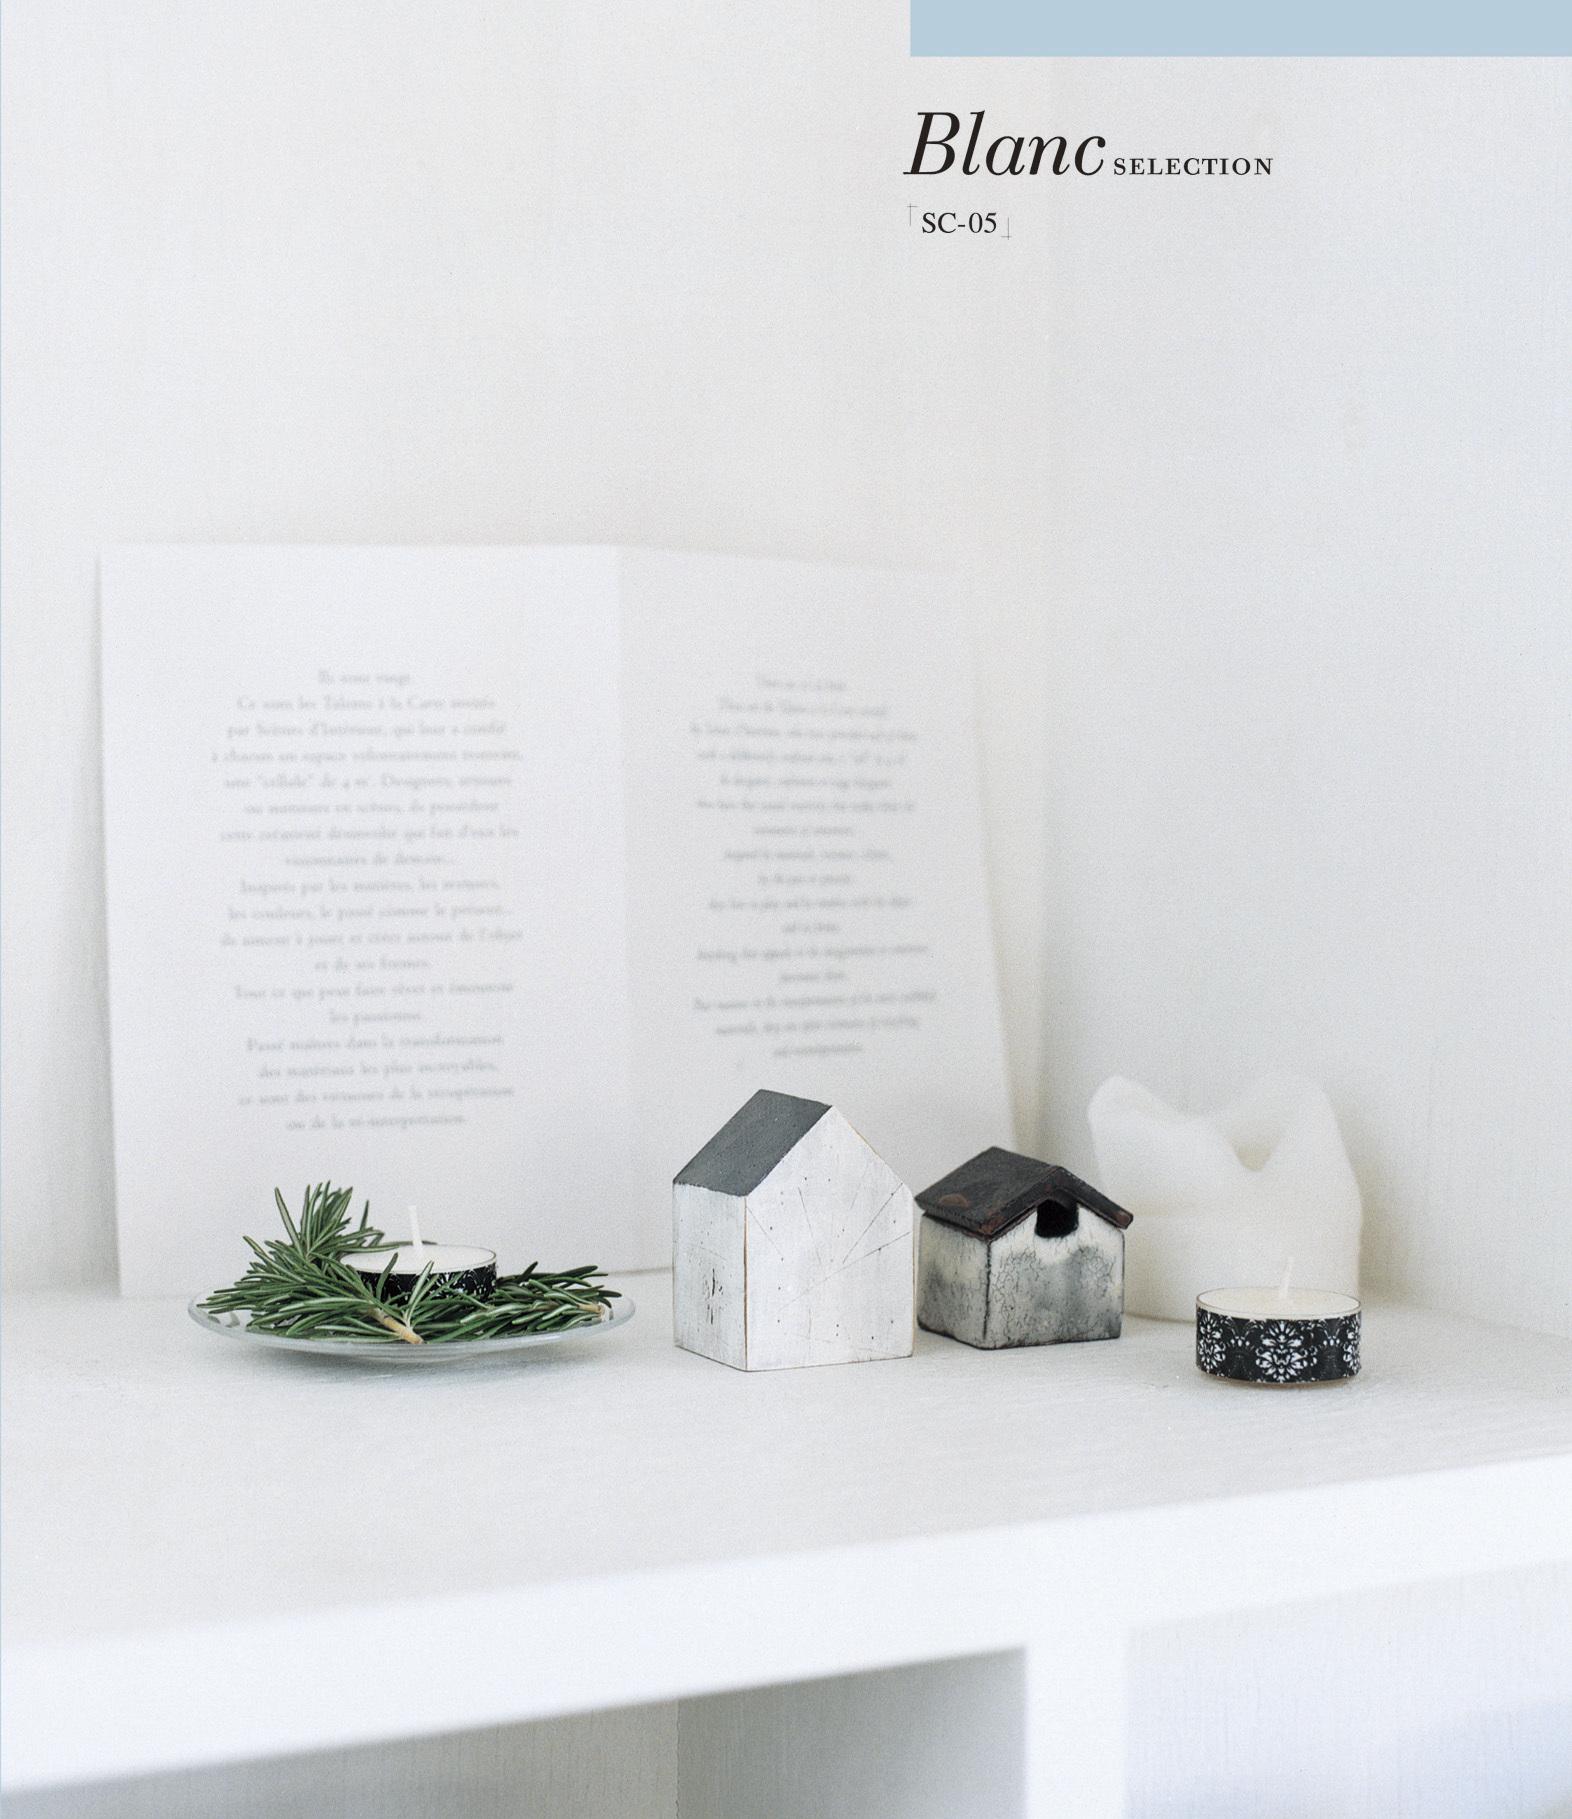 Blanc SC-05